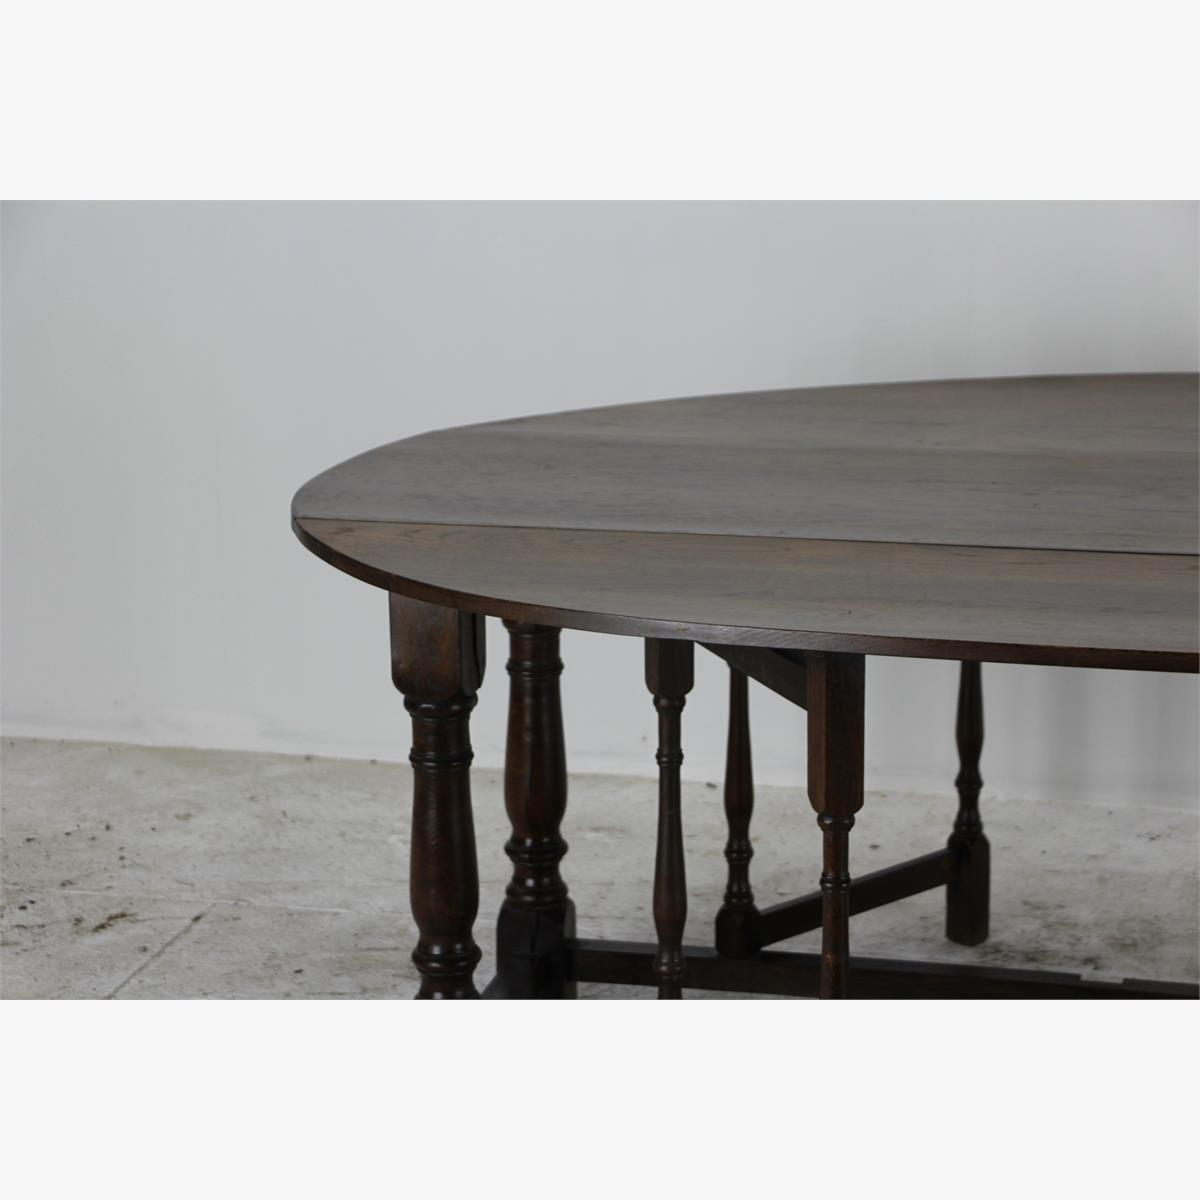 Afbeeldingen van grote ovale engelse eettafel massief eik    kan ook als side table